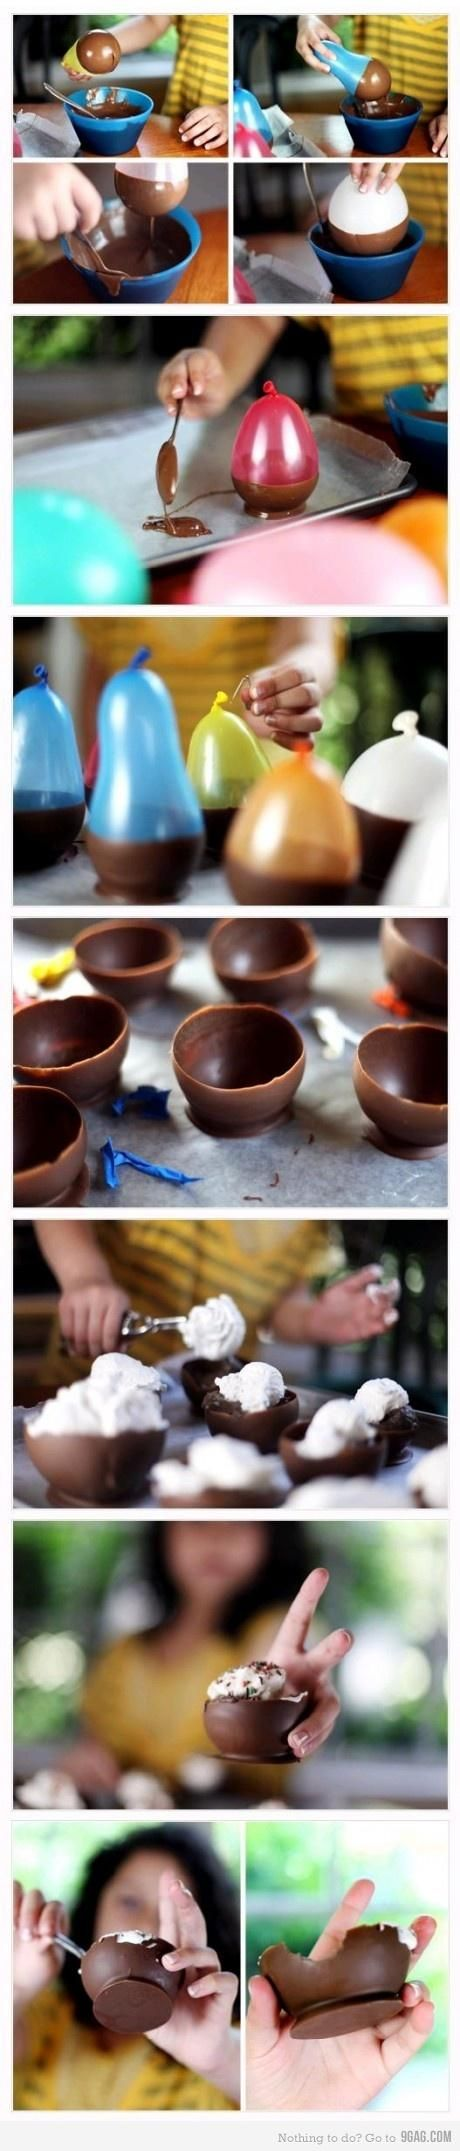 Dessert Schalen aus Schokolade